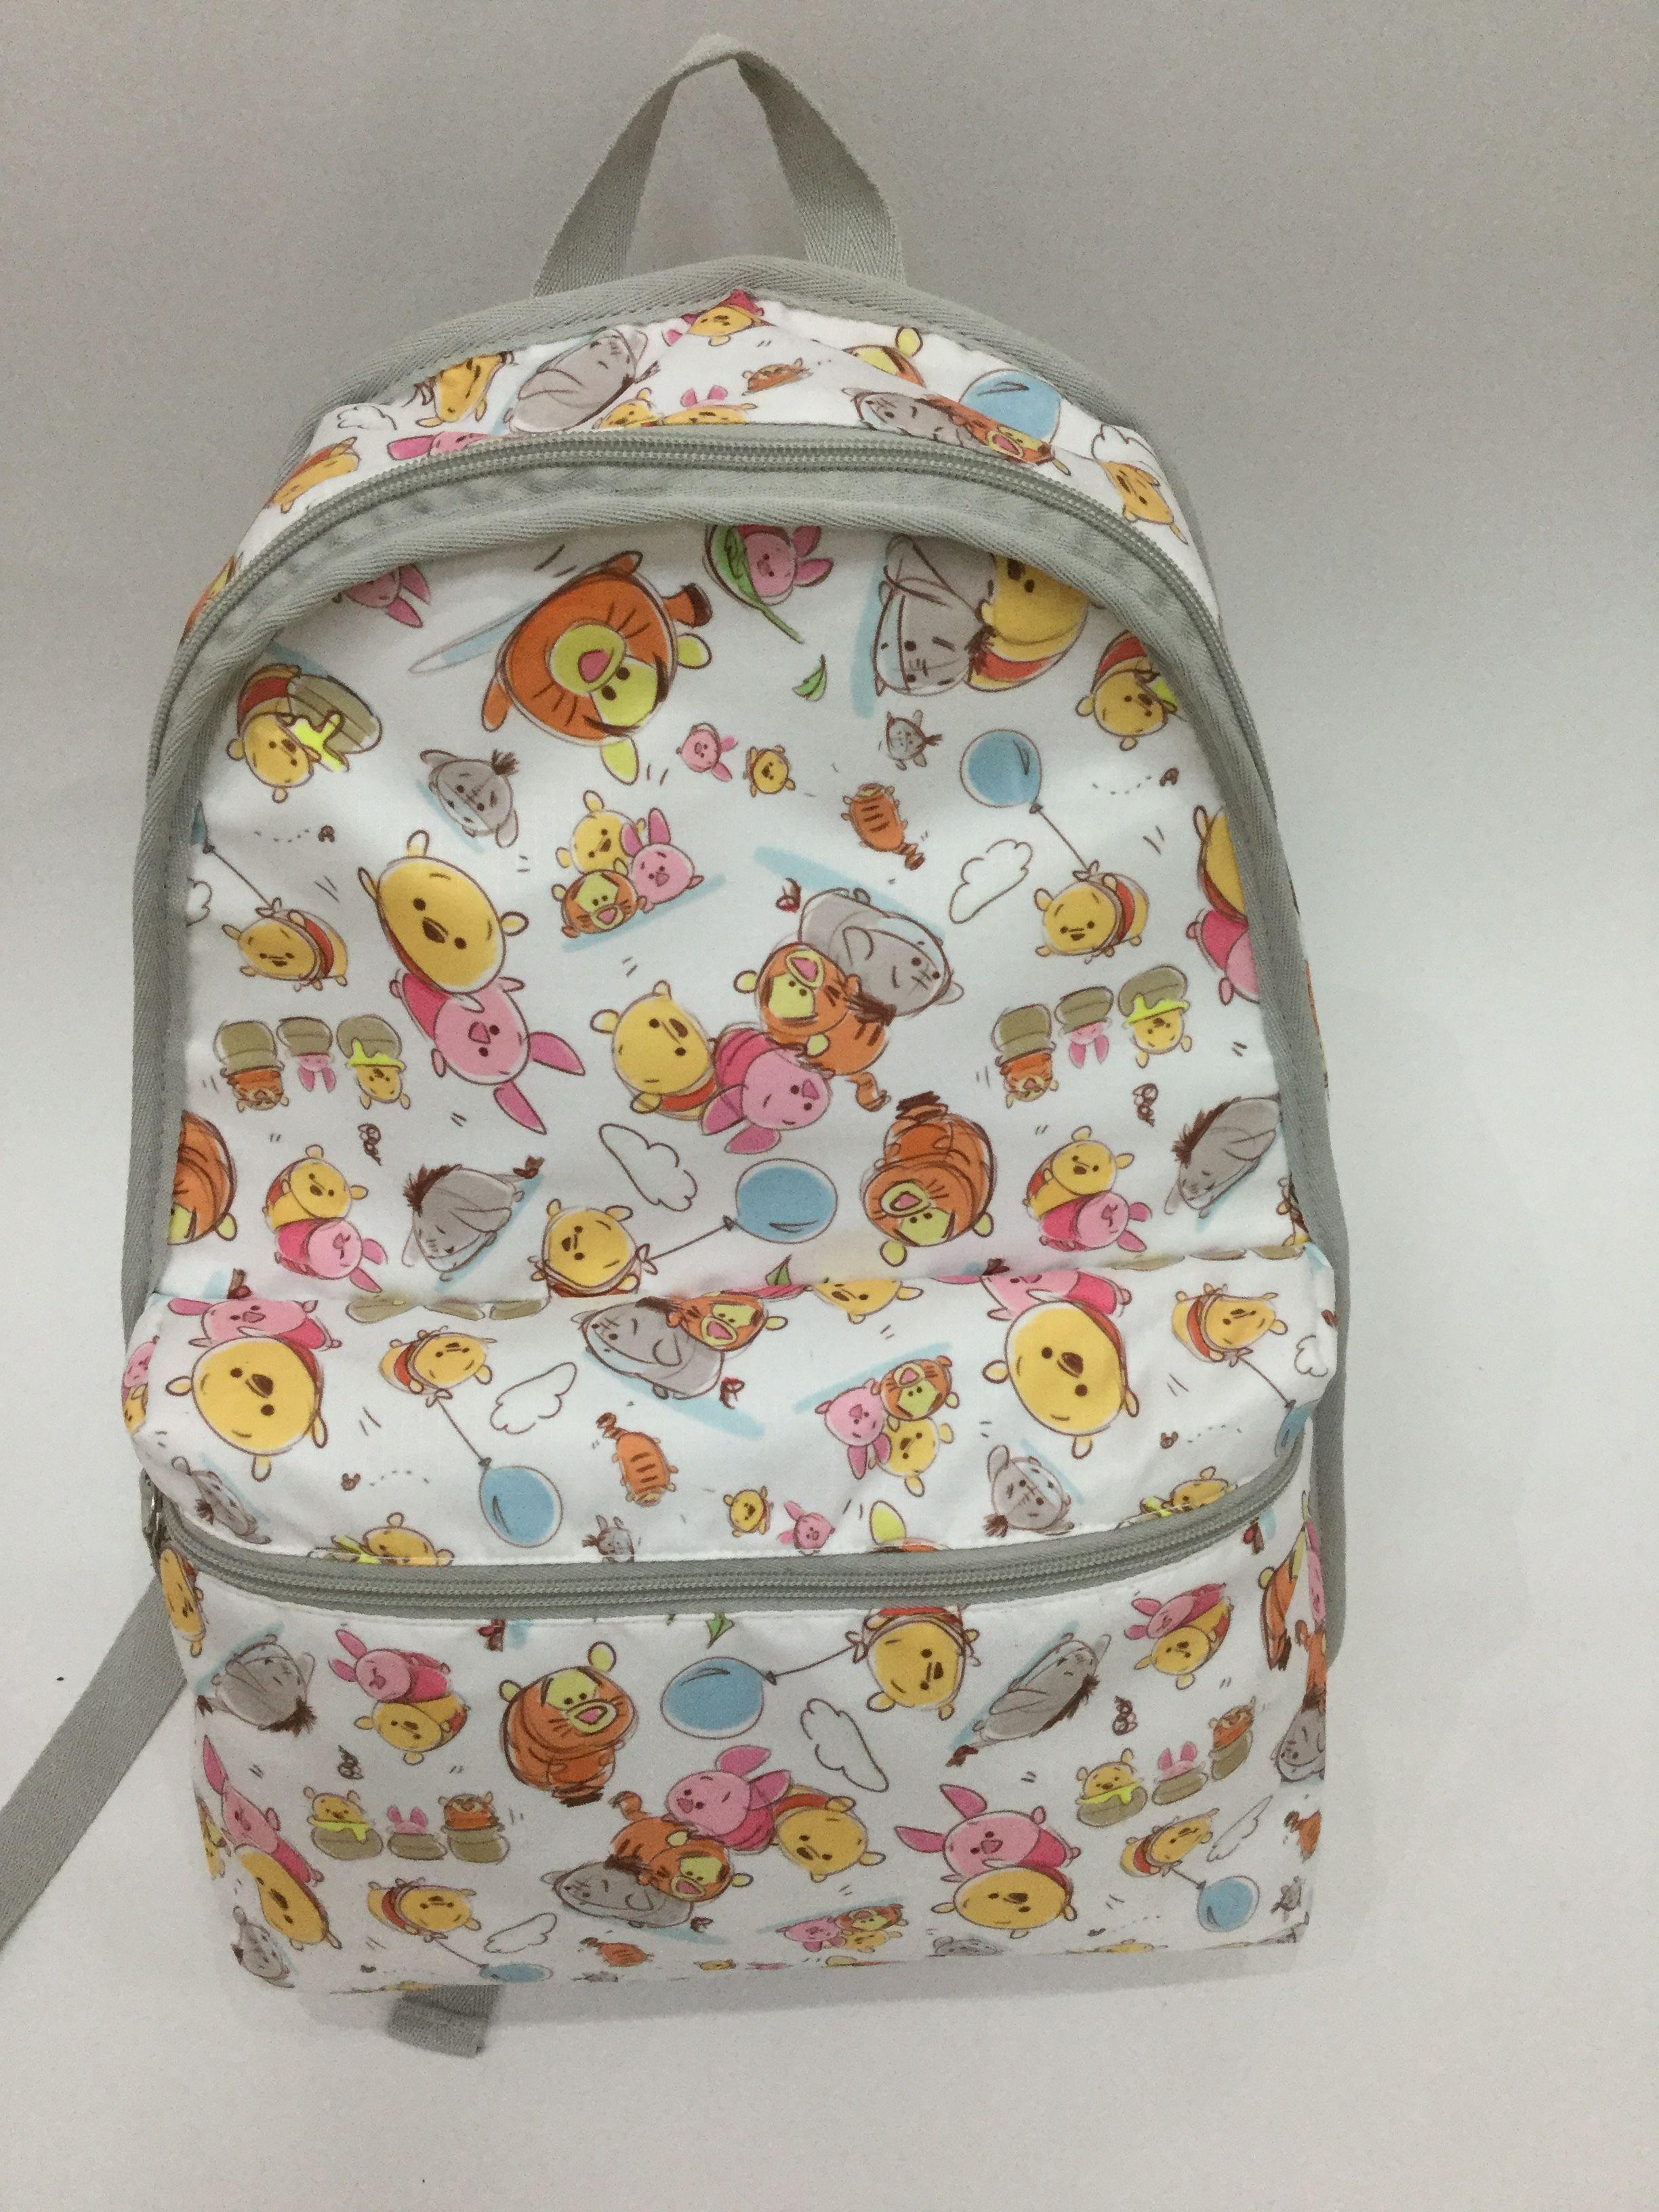 5999e300883 Cute Winnie the Pooh school bag